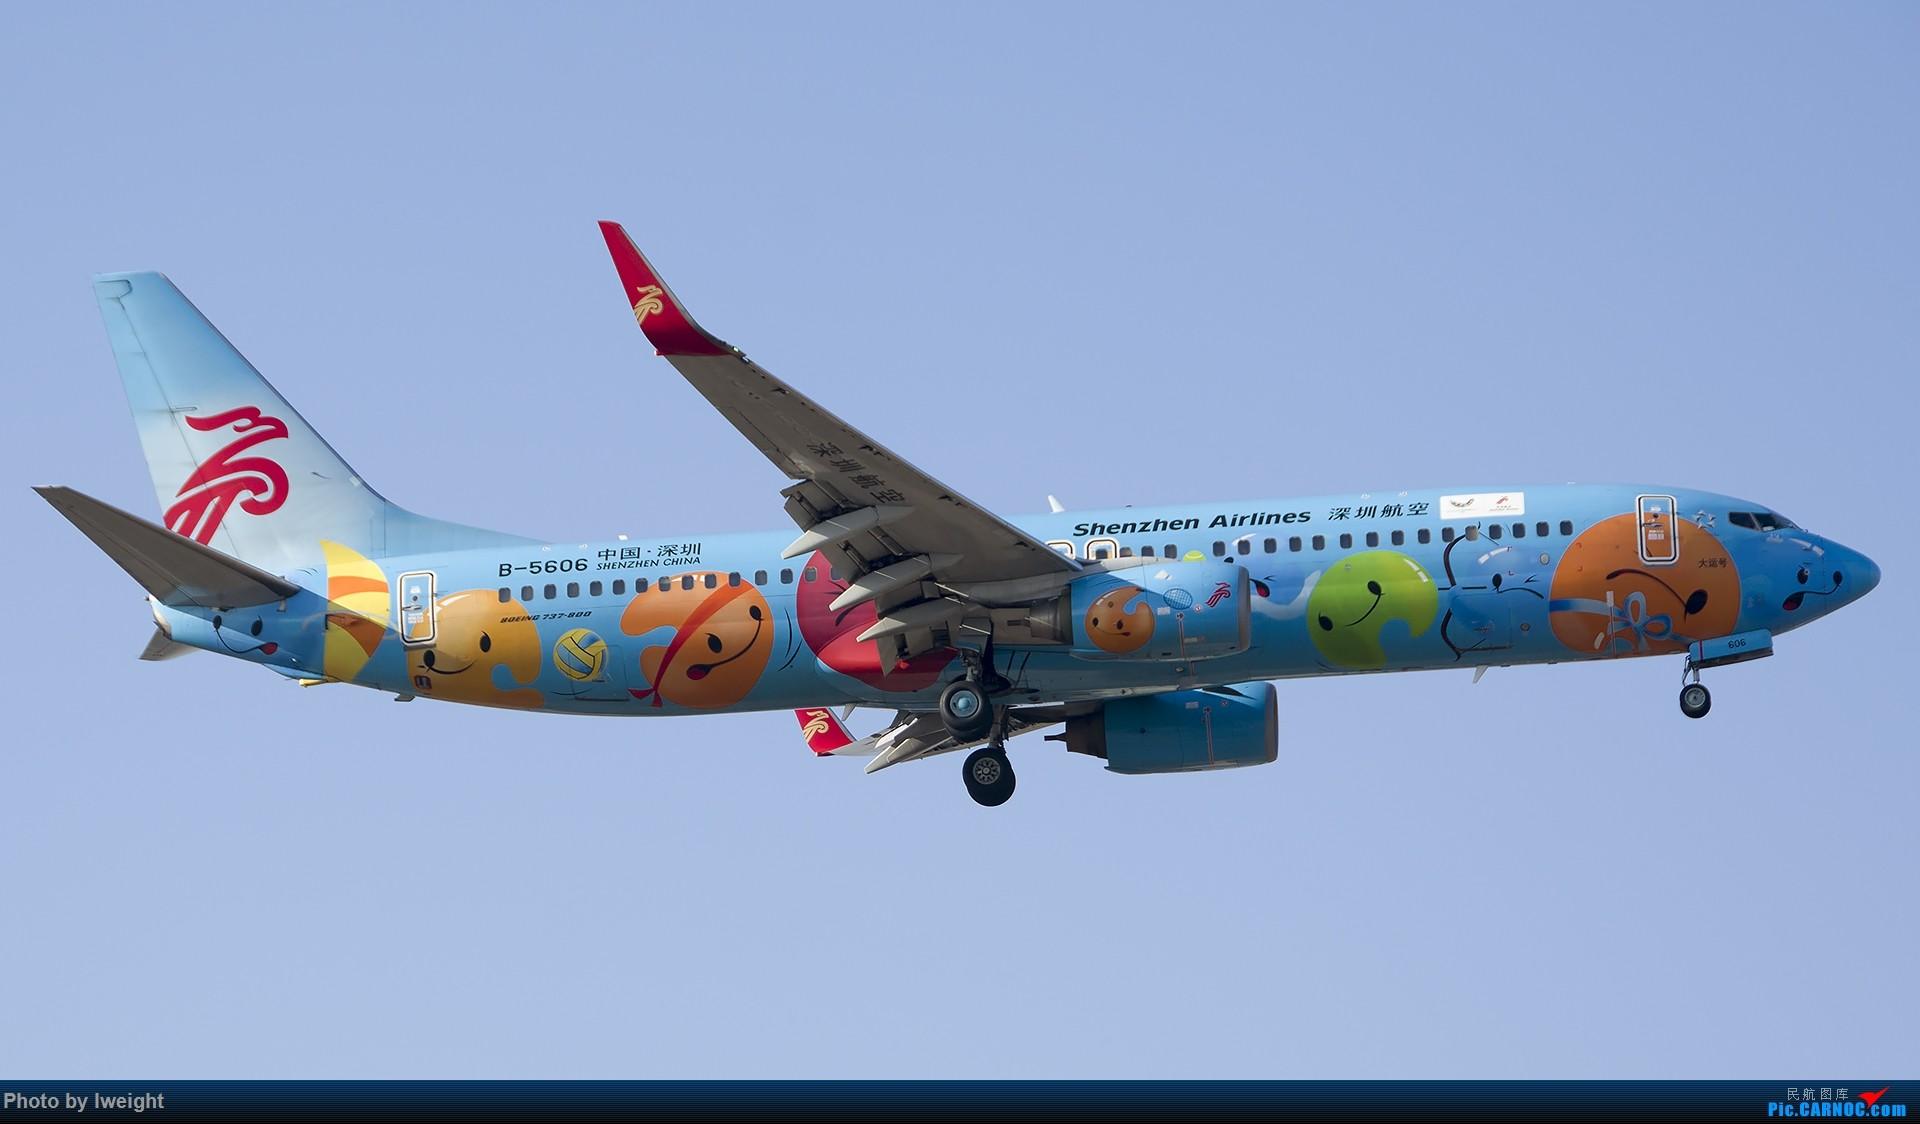 Re:[原创]庆祝升级777,发上今天在首都机场拍的所有飞机【2014-12-14】 BOEING 737-800 B-5606 中国北京首都国际机场